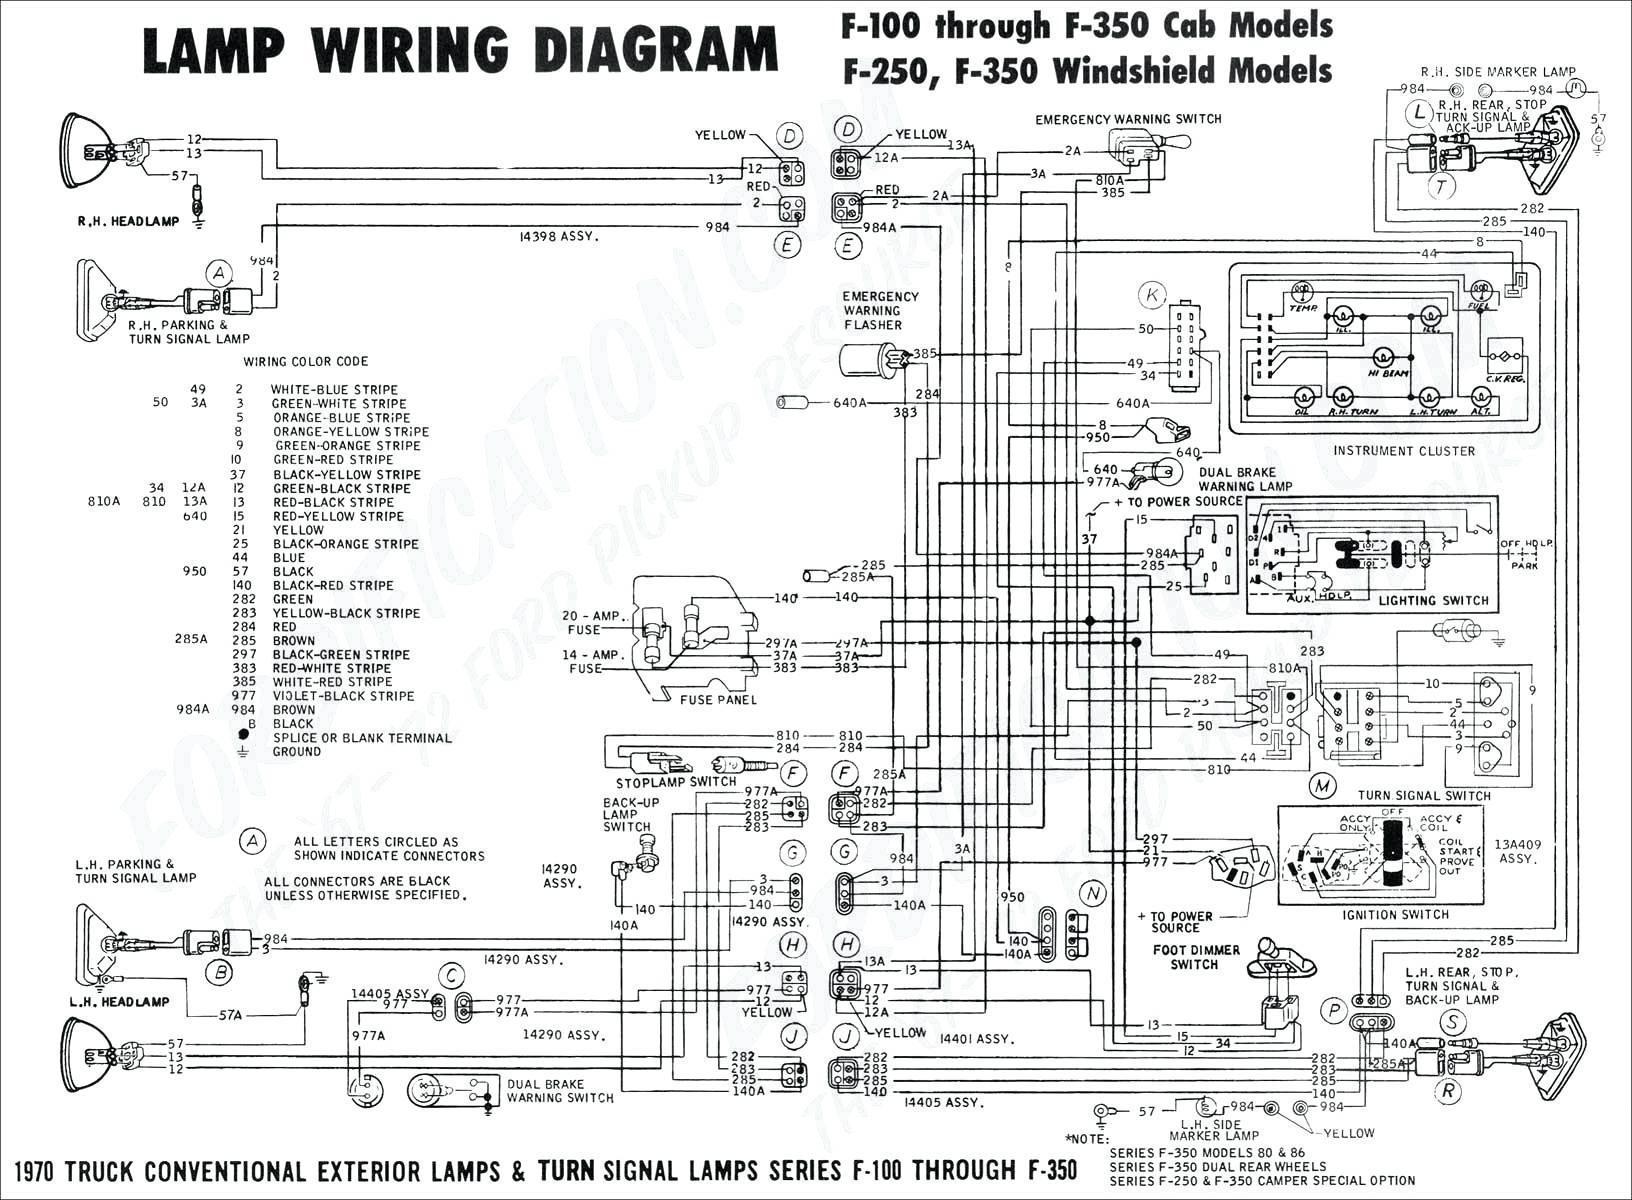 2001 Silverado Wiring Diagram 2001 Silverado Tail Light Wiring Diagram